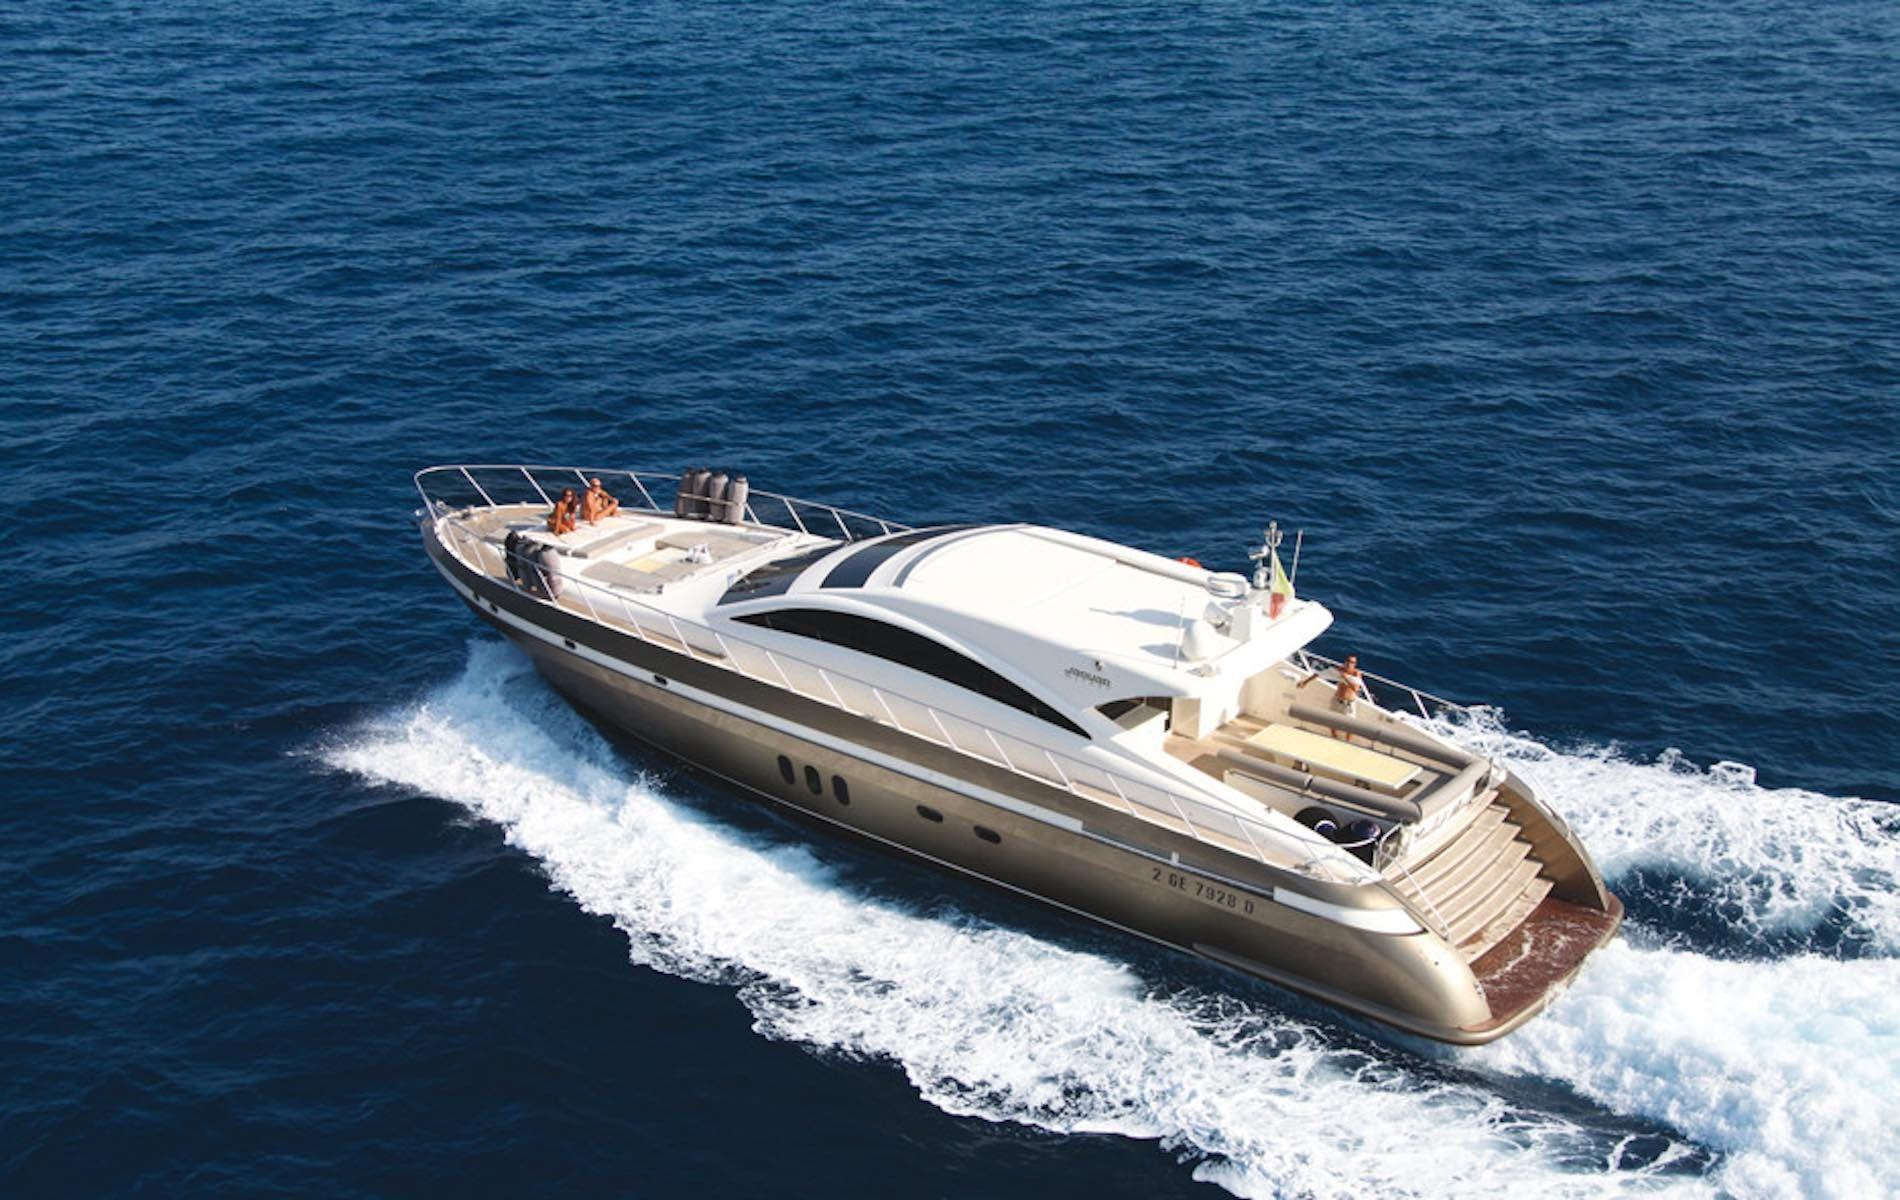 Jaguar 76 - Day Charter - Poltu Quatu - Sardinia - Italy